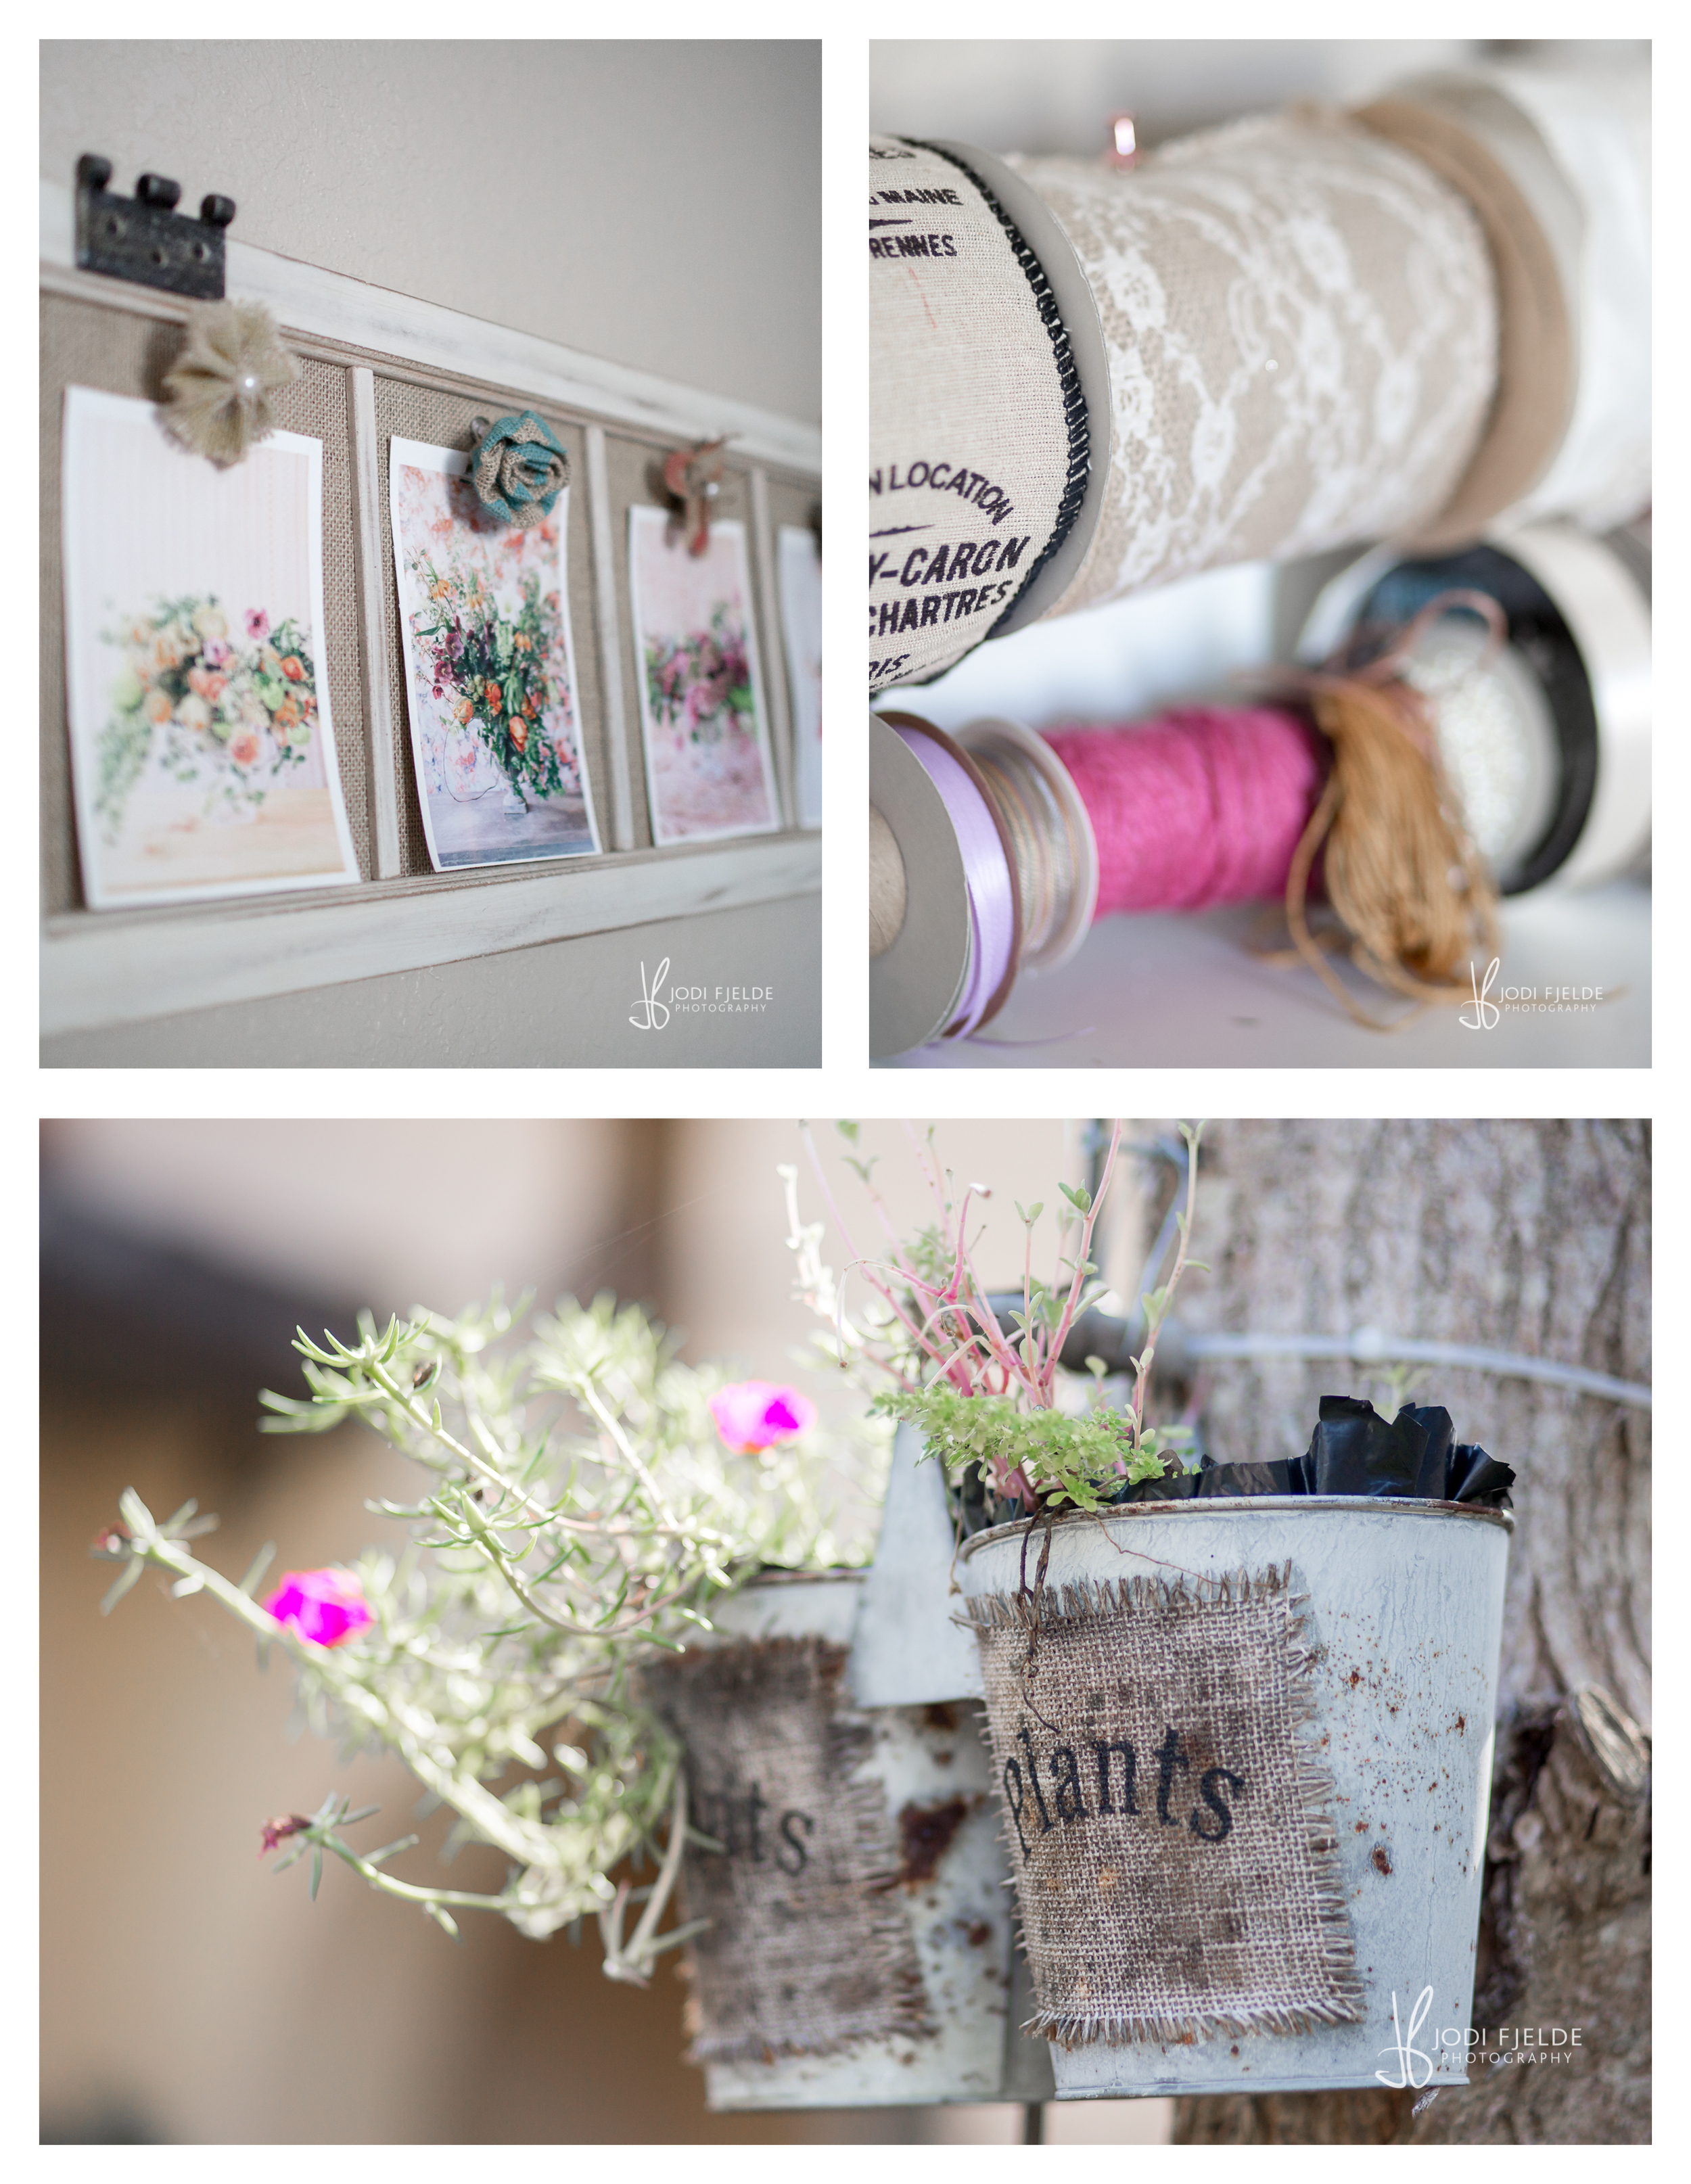 Parkland_Commercial_Business_Branding_Photography_Flowerly Studio_Jodi_Fjelde_Photogrpahy_2.jpg